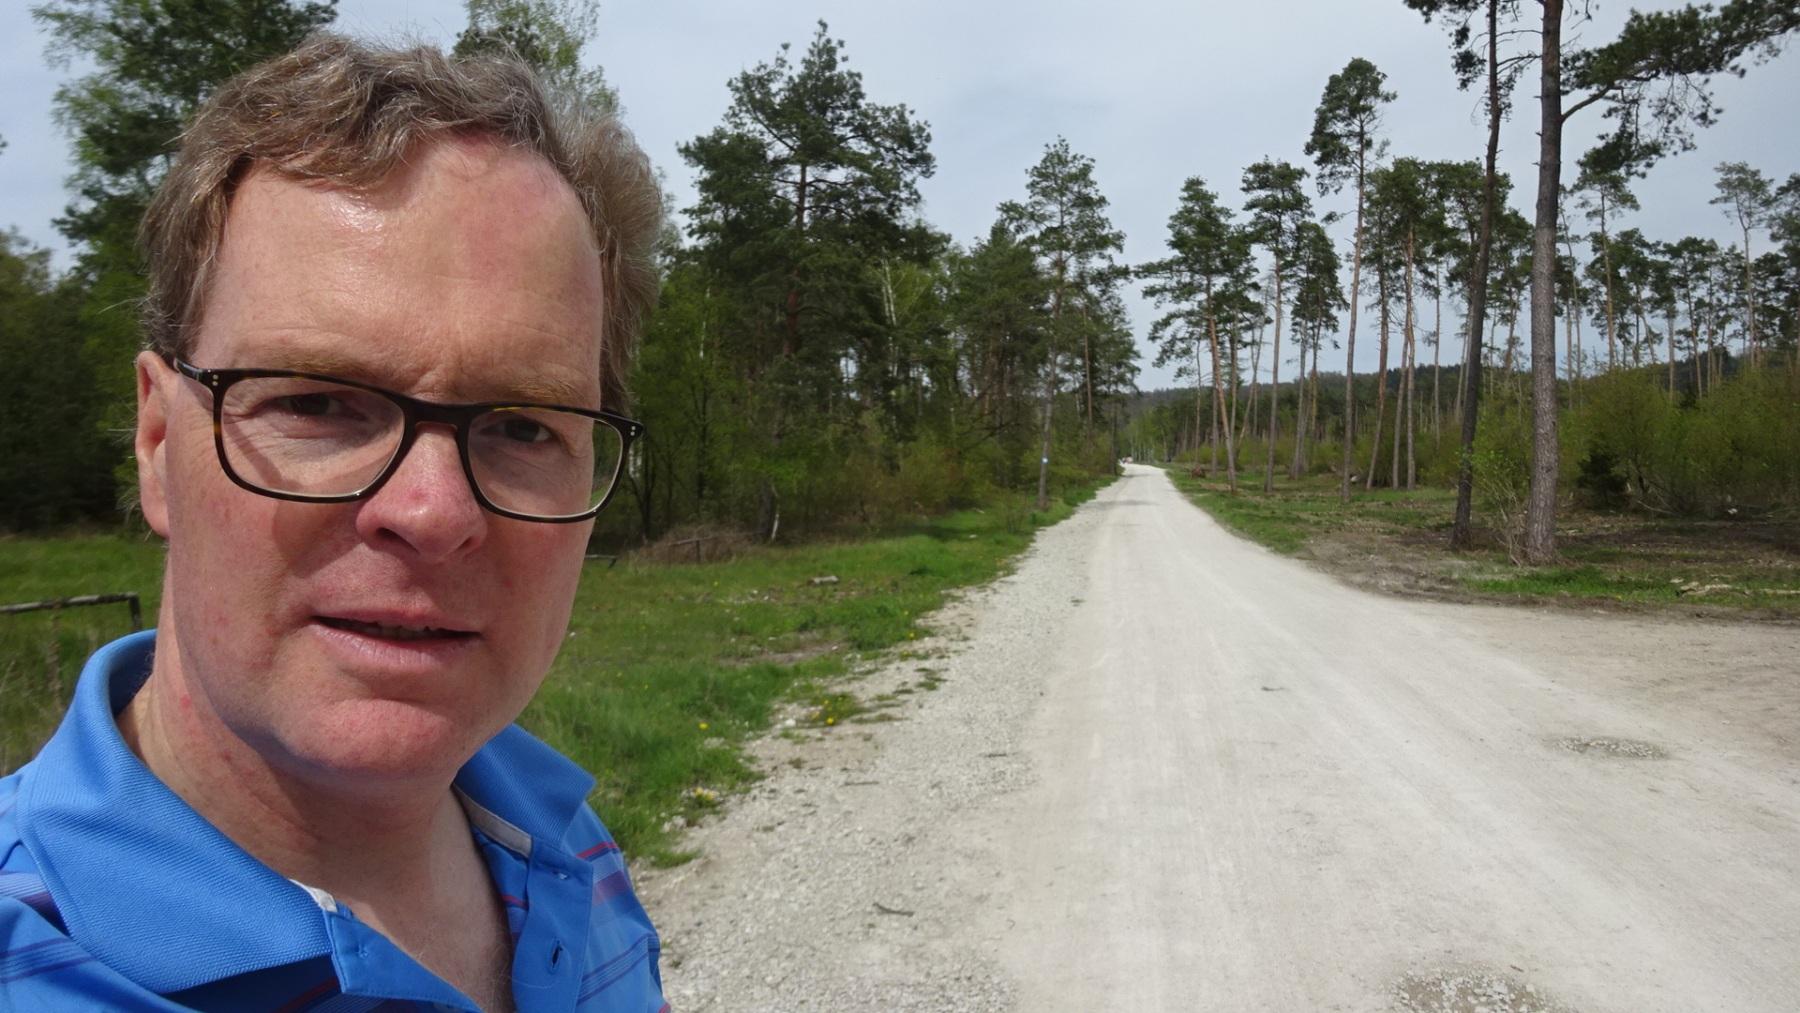 Brechmann-Frank-17-Challenge-Nature-Run-lxzFo